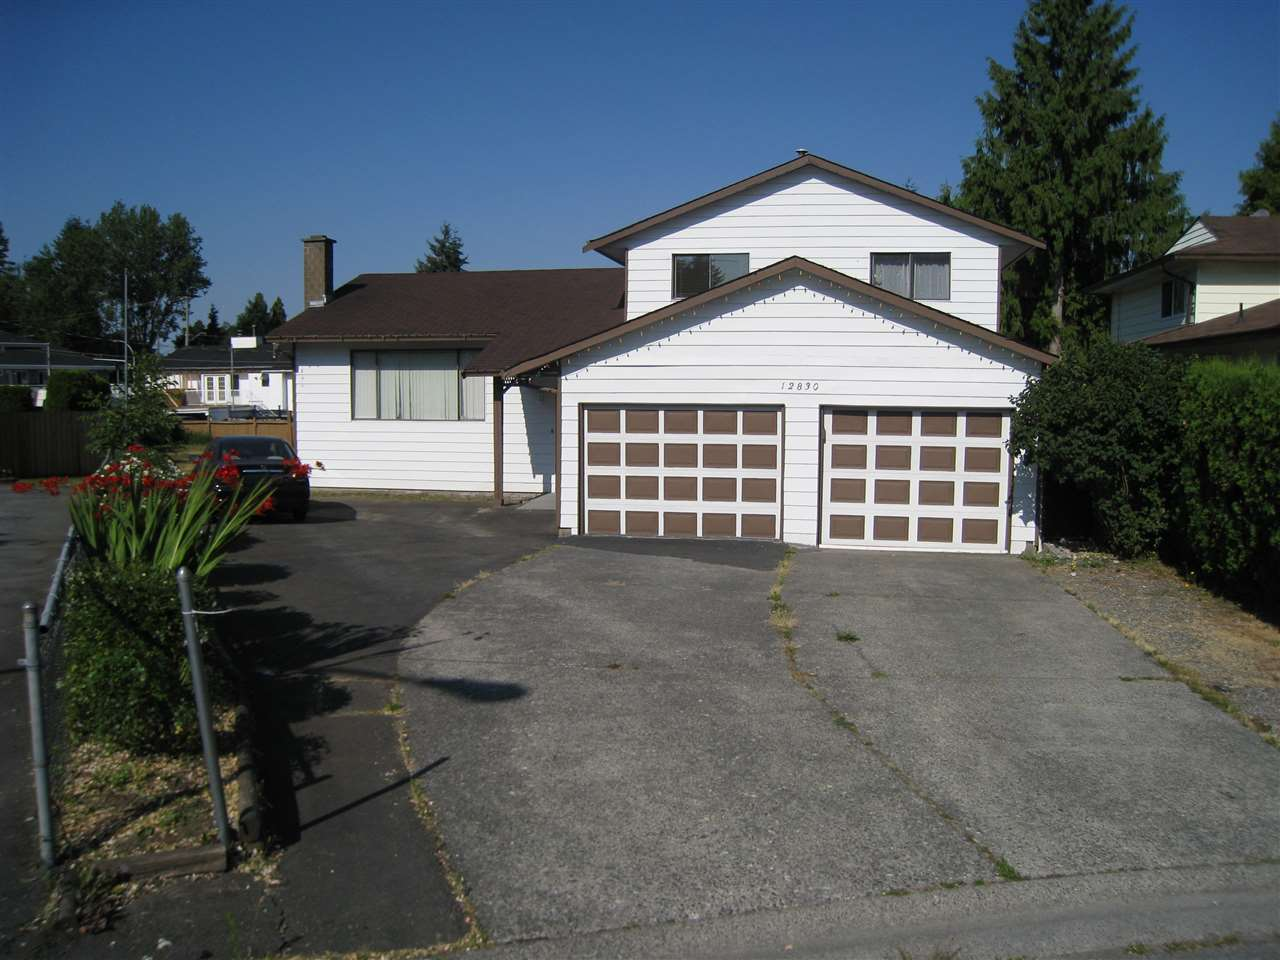 Detached at 12830 104A AVENUE, North Surrey, British Columbia. Image 1